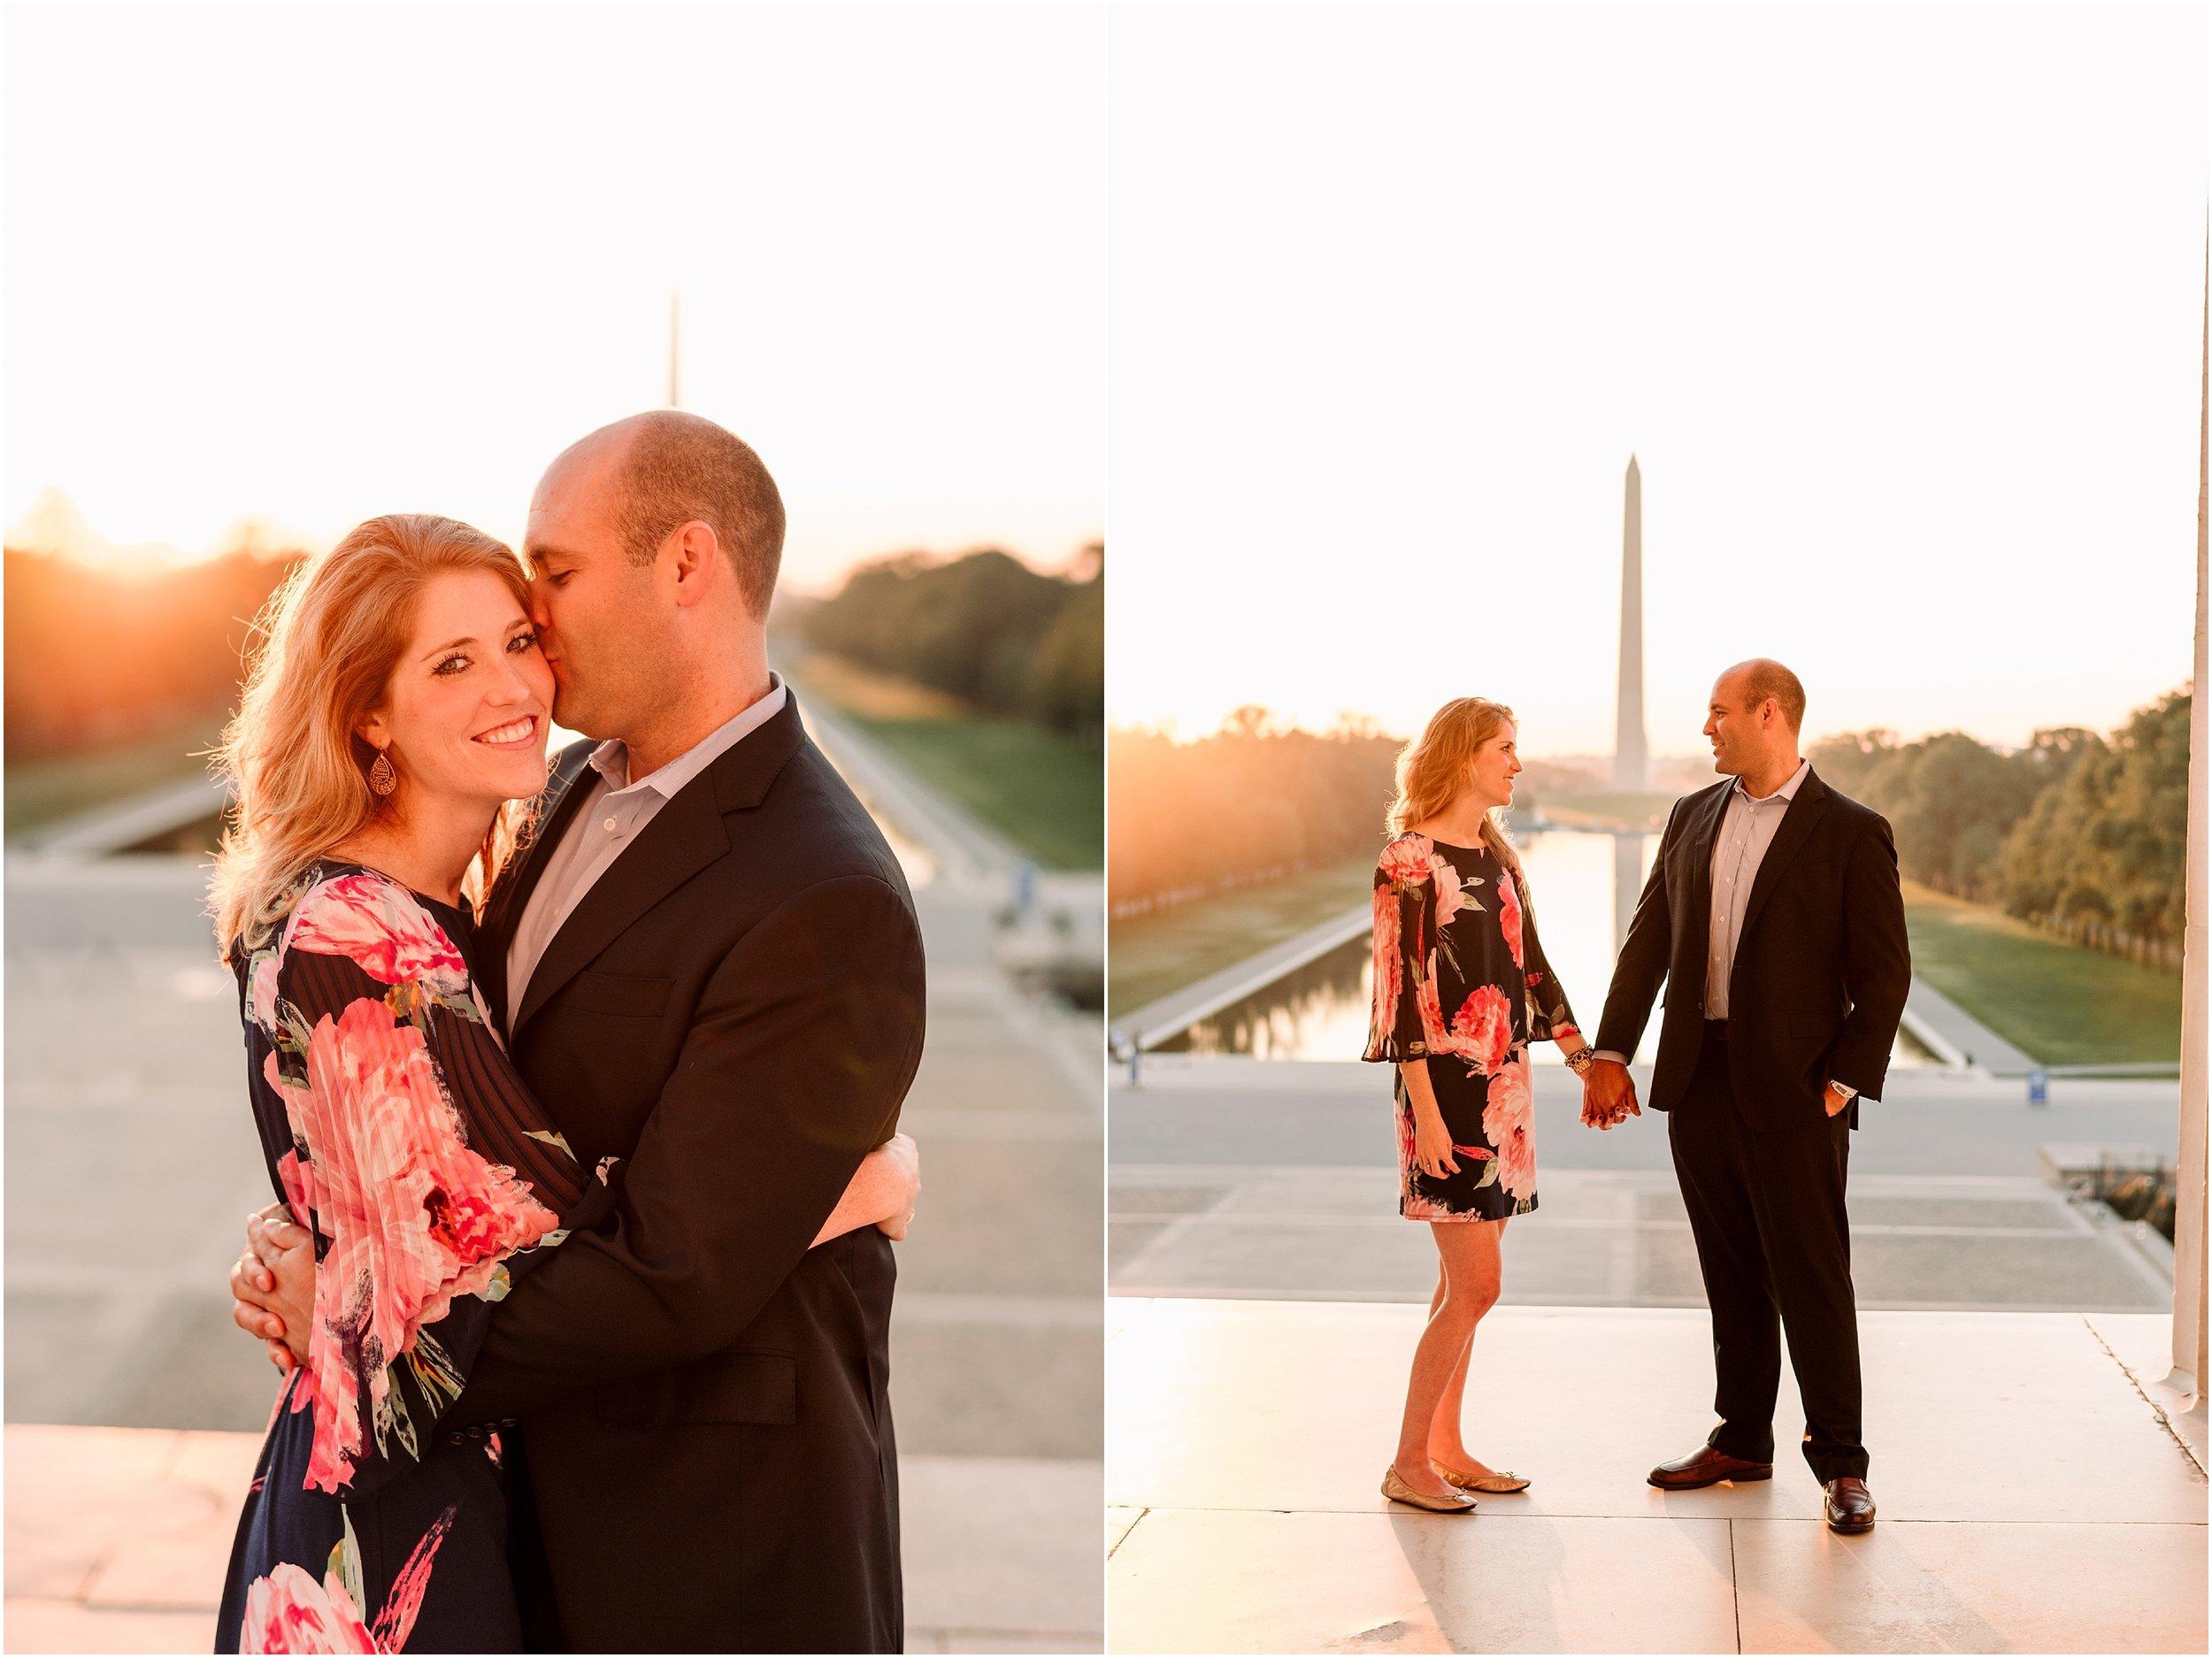 hannah leigh photography Sunrise Jefferson Memorial Engagement Session, Washington DC_1007.jpg